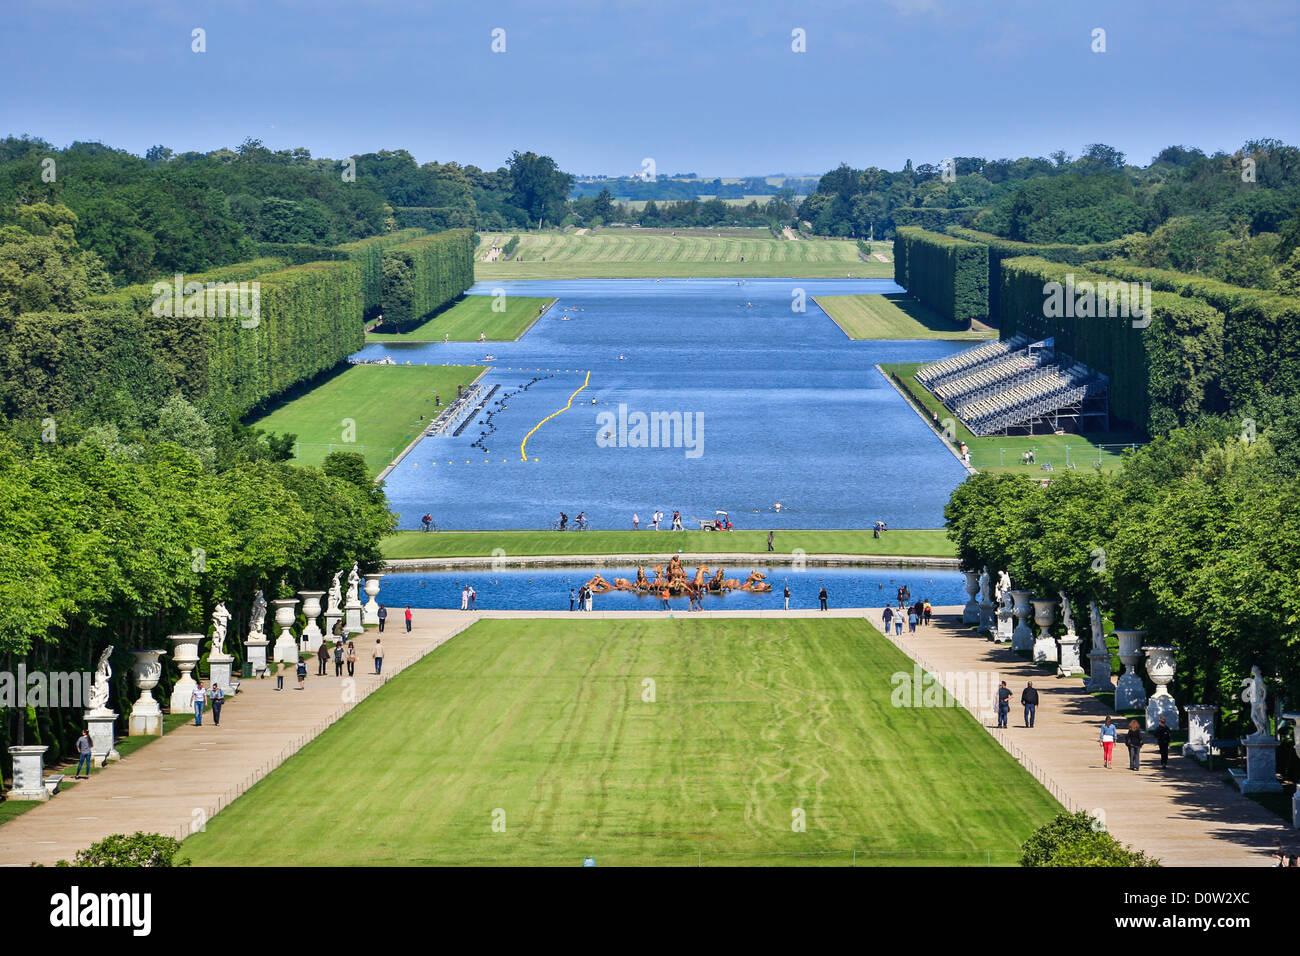 Francia, Europa, viaggi, Versailles, patrimonio mondiale, giardini, dettaglio, architettura, parco, storia, turismo, Immagini Stock